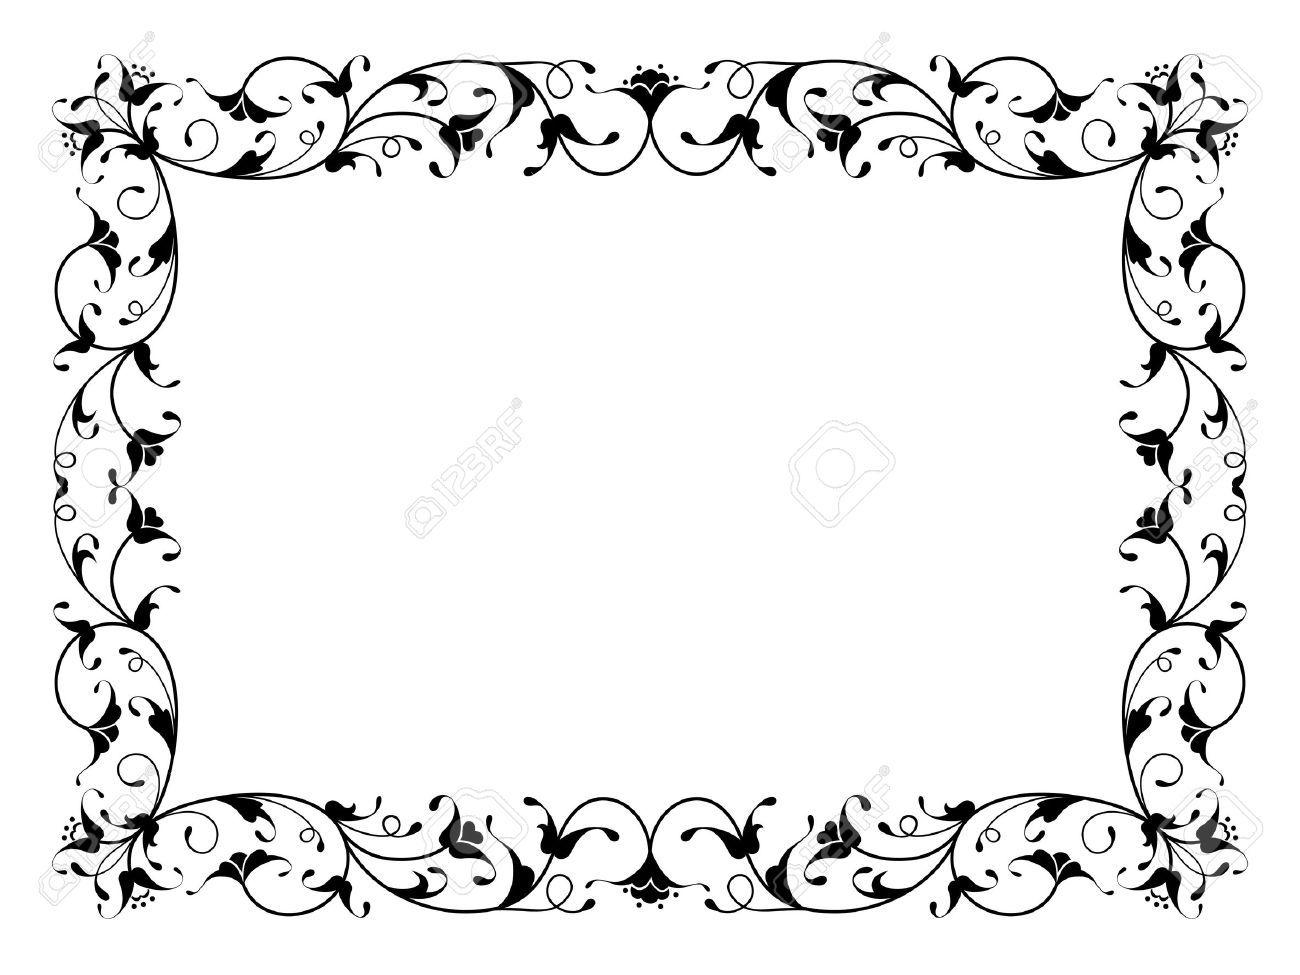 motif d 39 encadrement floral oriental ornemental d co noir isol transferts pinterest. Black Bedroom Furniture Sets. Home Design Ideas